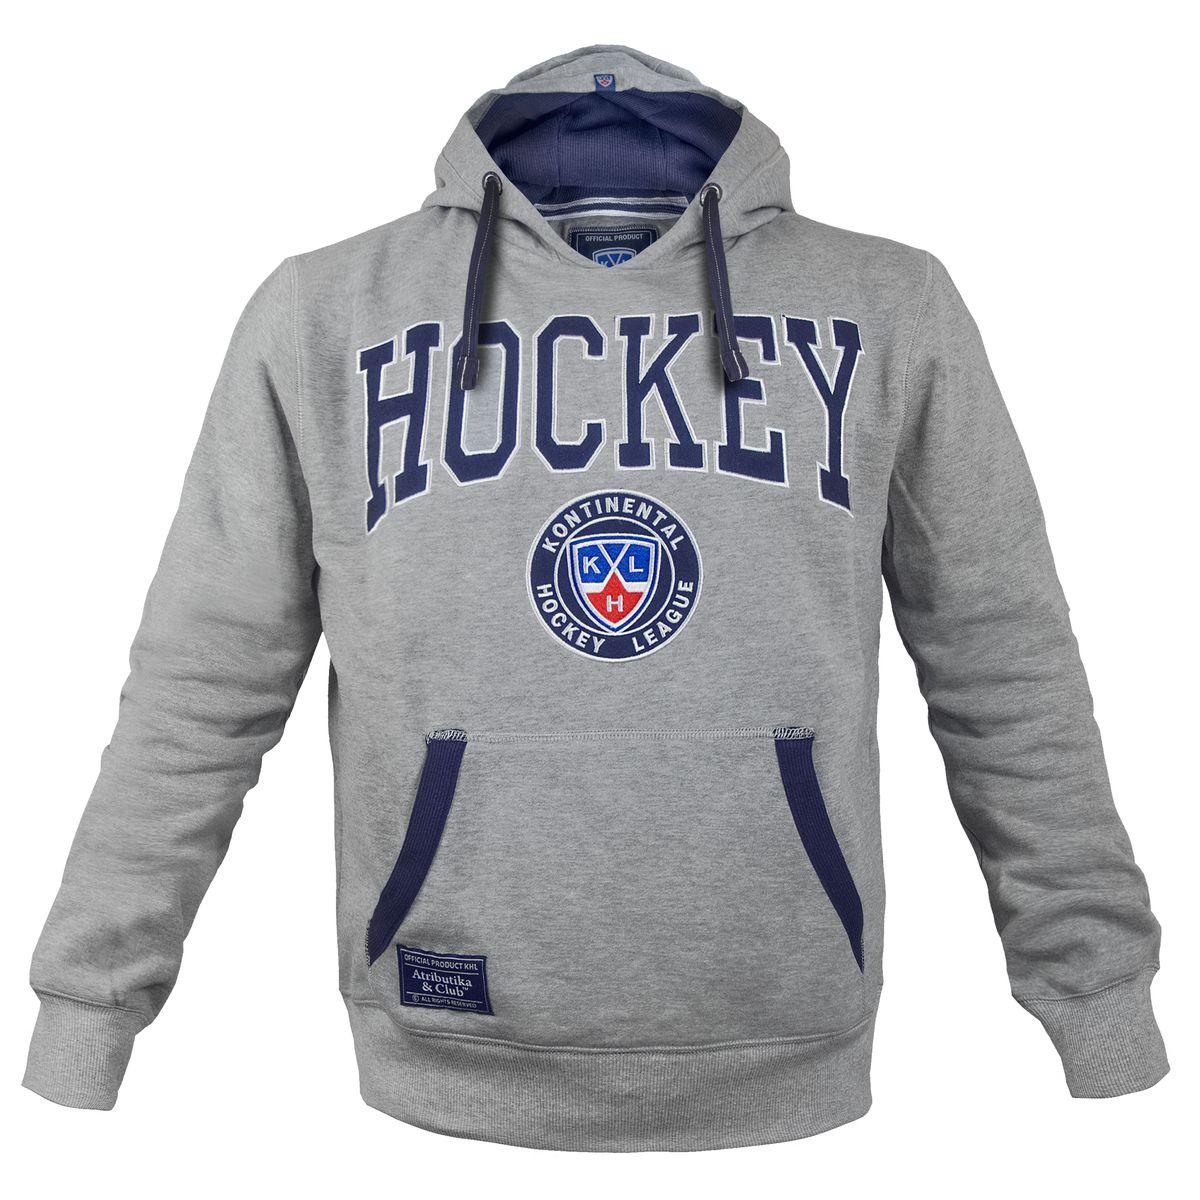 Толстовка мужская КХЛ, цвет: серый. 262870. Размер L (52) - Хоккейные клубы